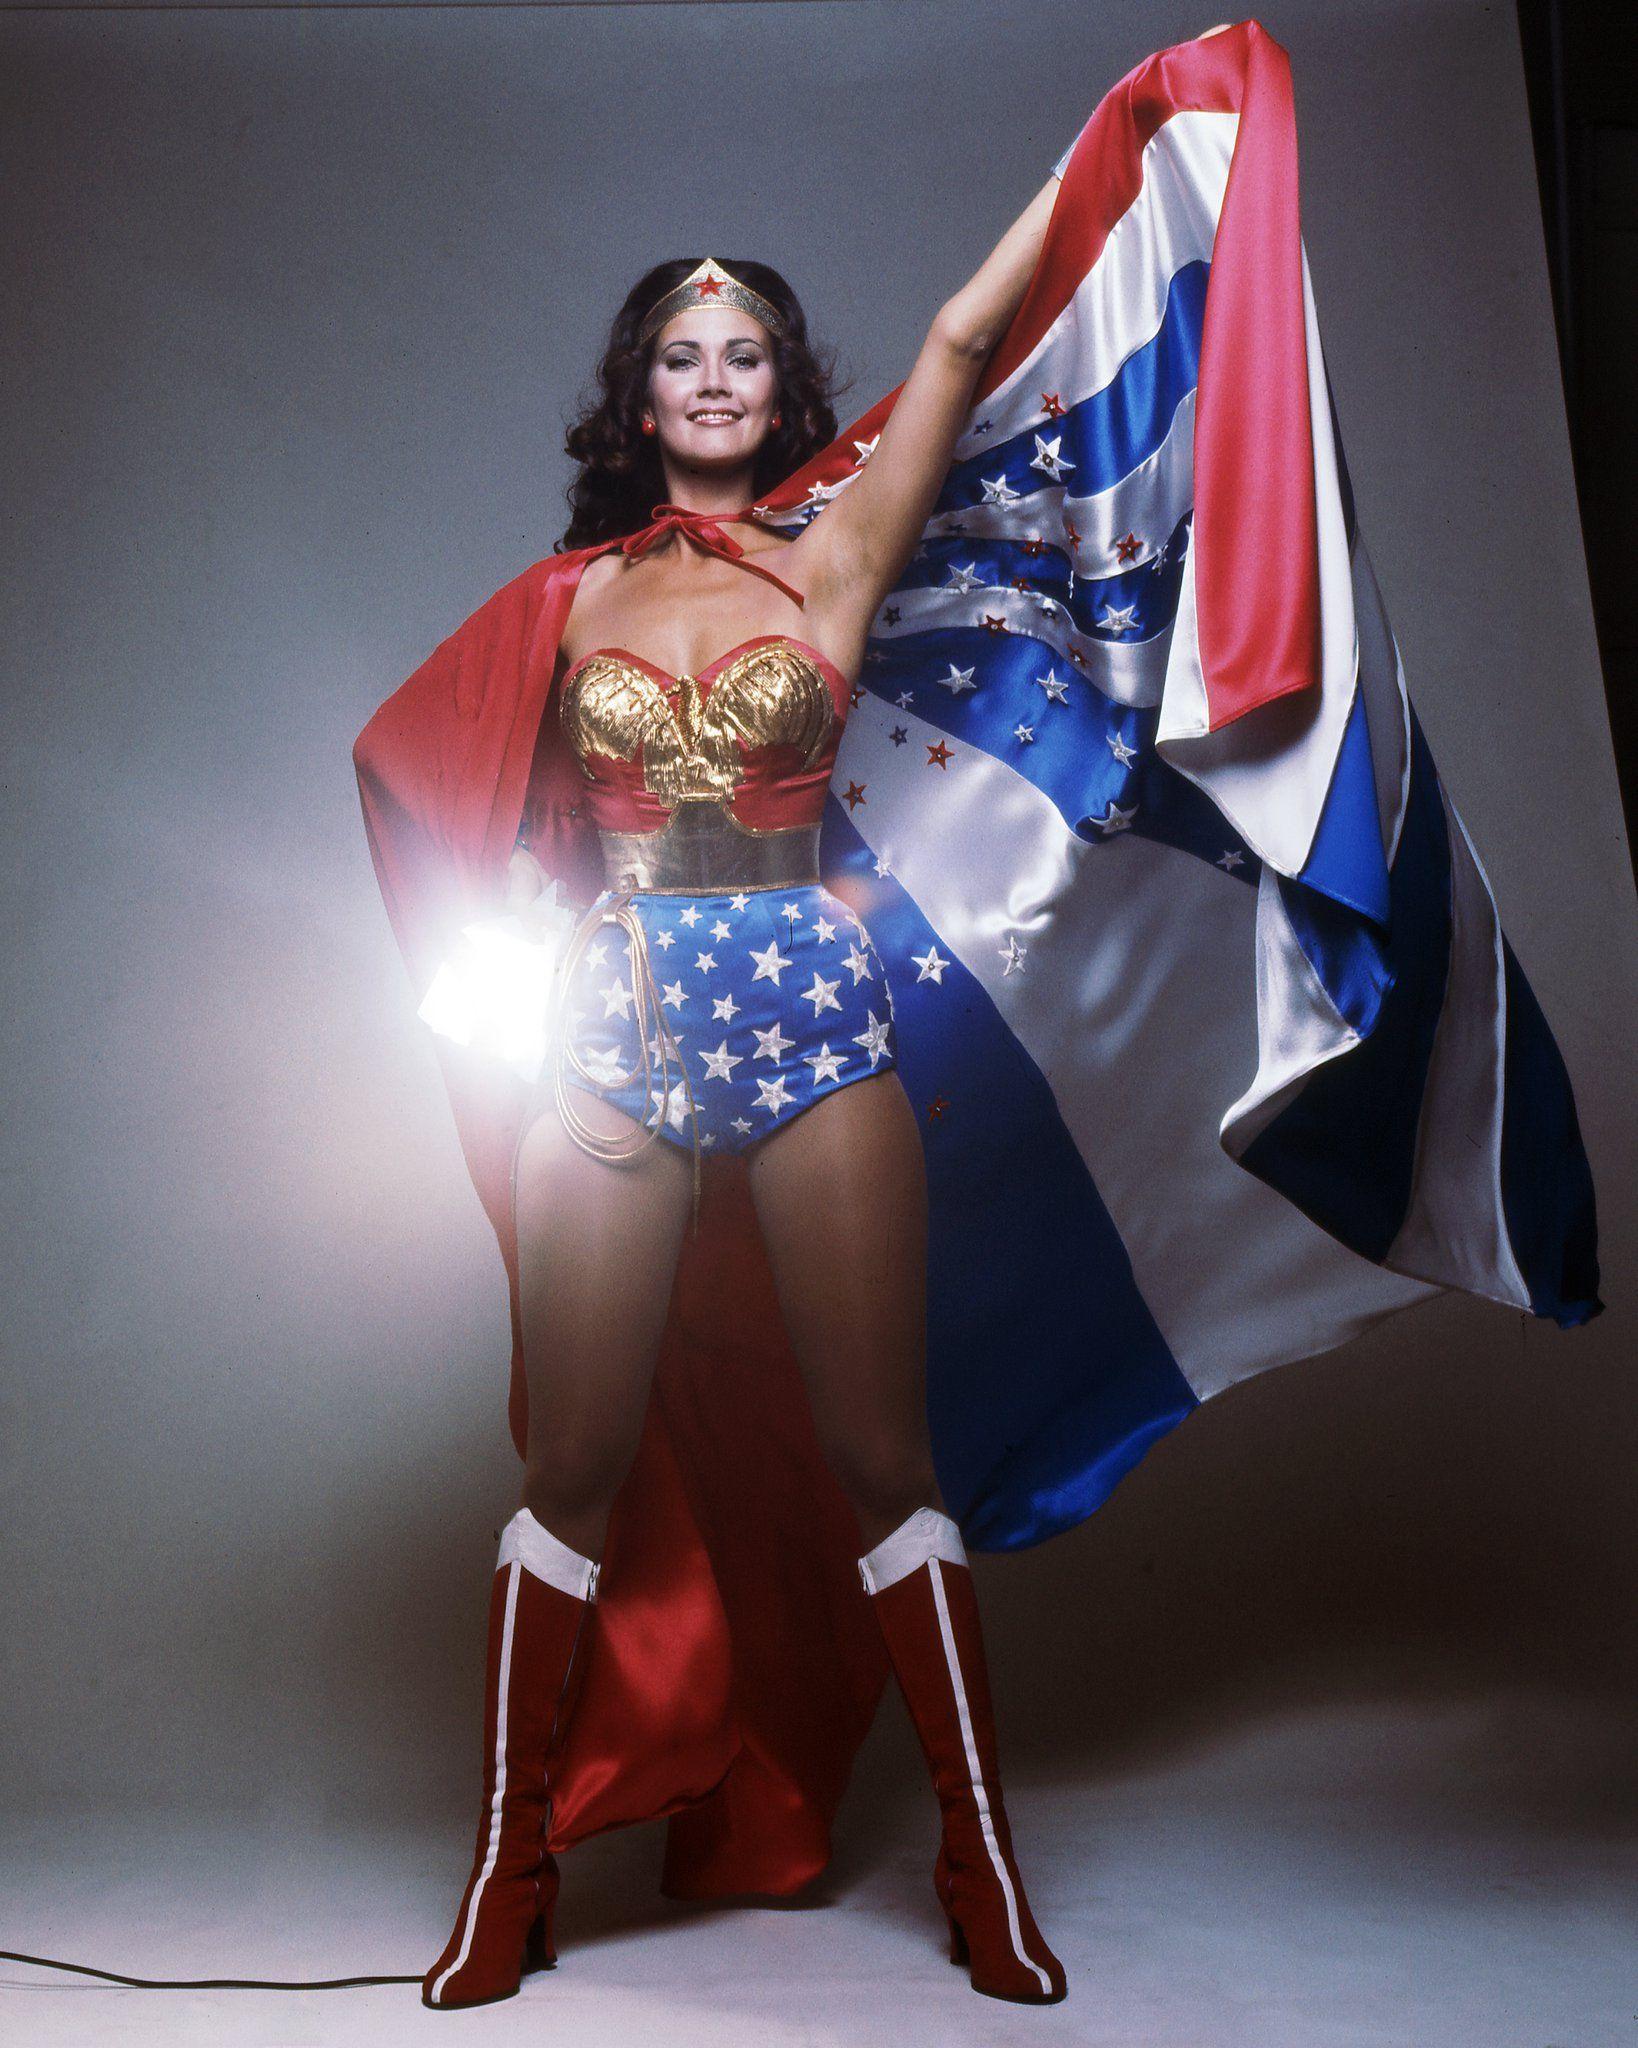 Man in wonder woman costume-9146